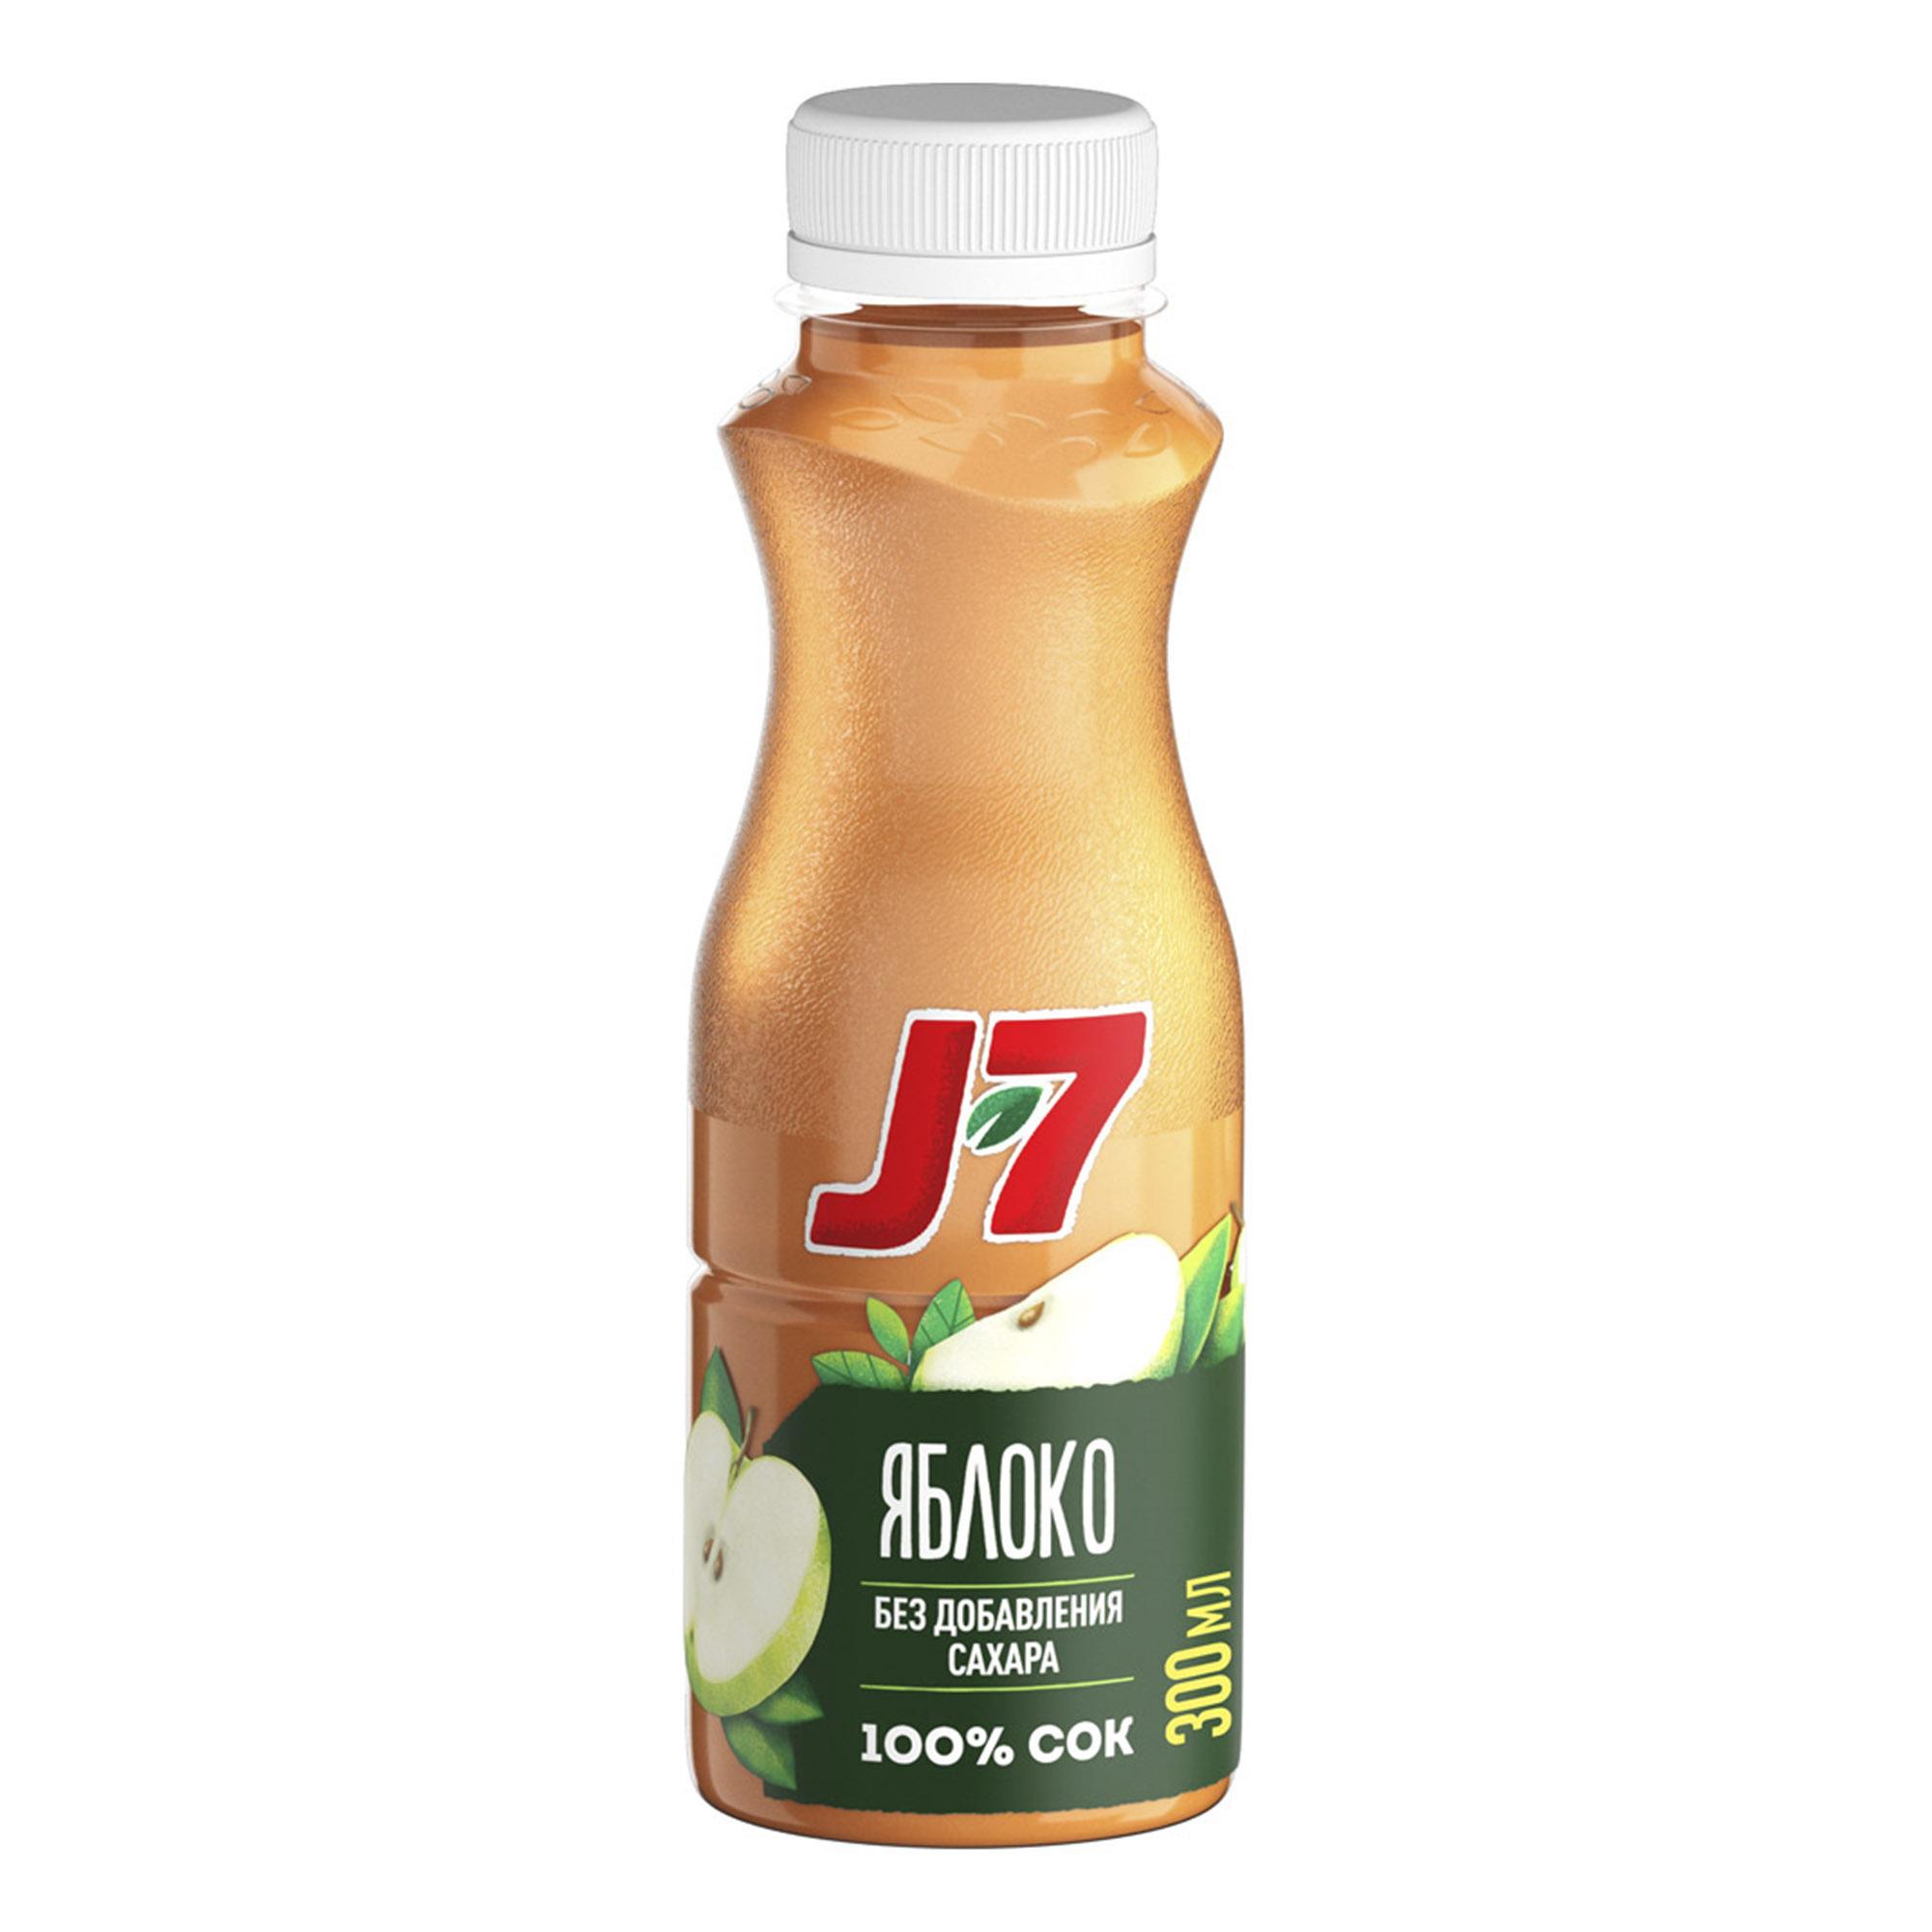 Фото - Сок J7 Яблоко 300 мл сок томатный j7 тонус 900 мл